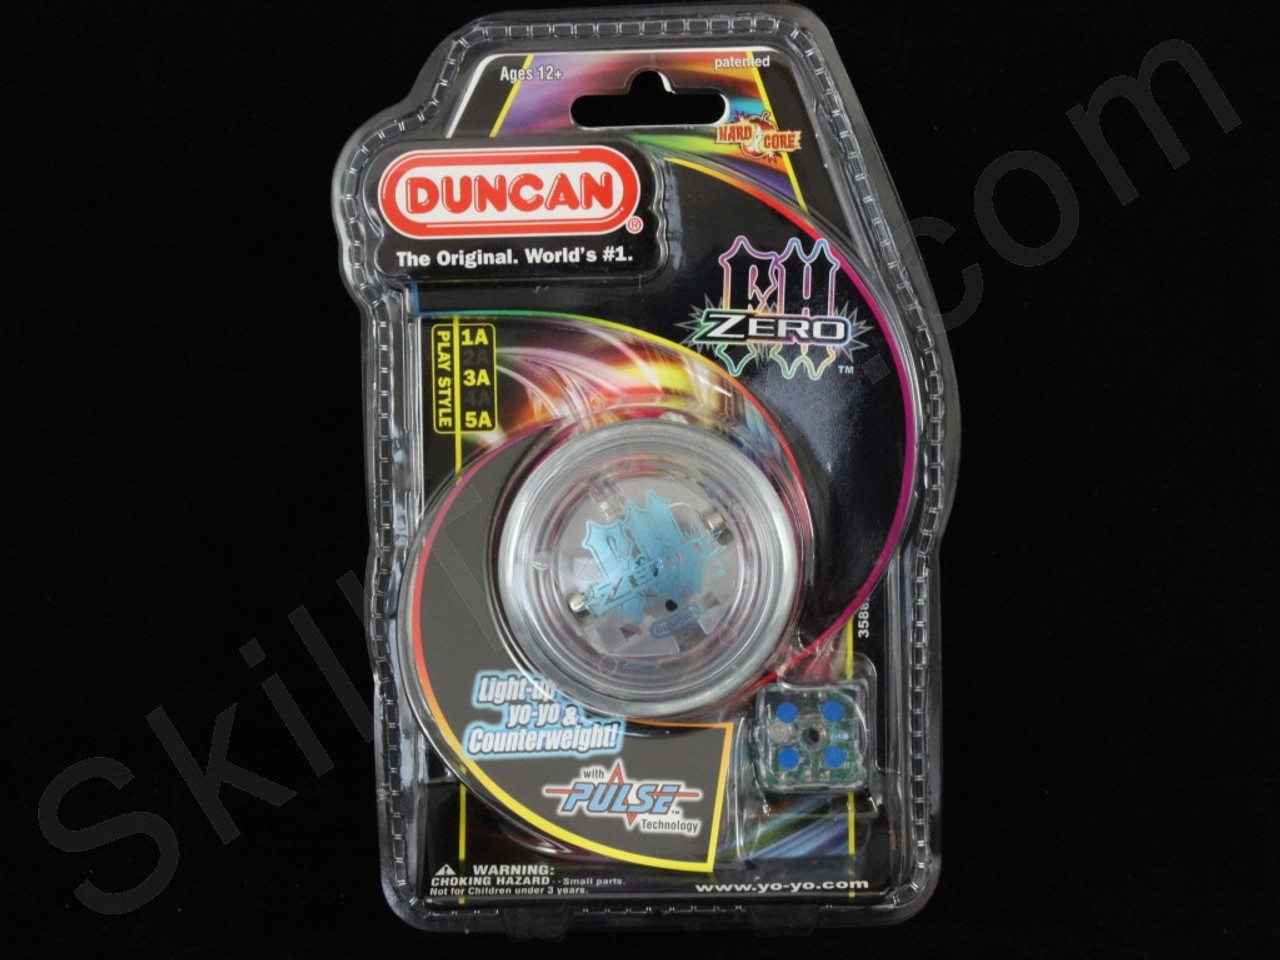 duncan freehand yoyo counterweight